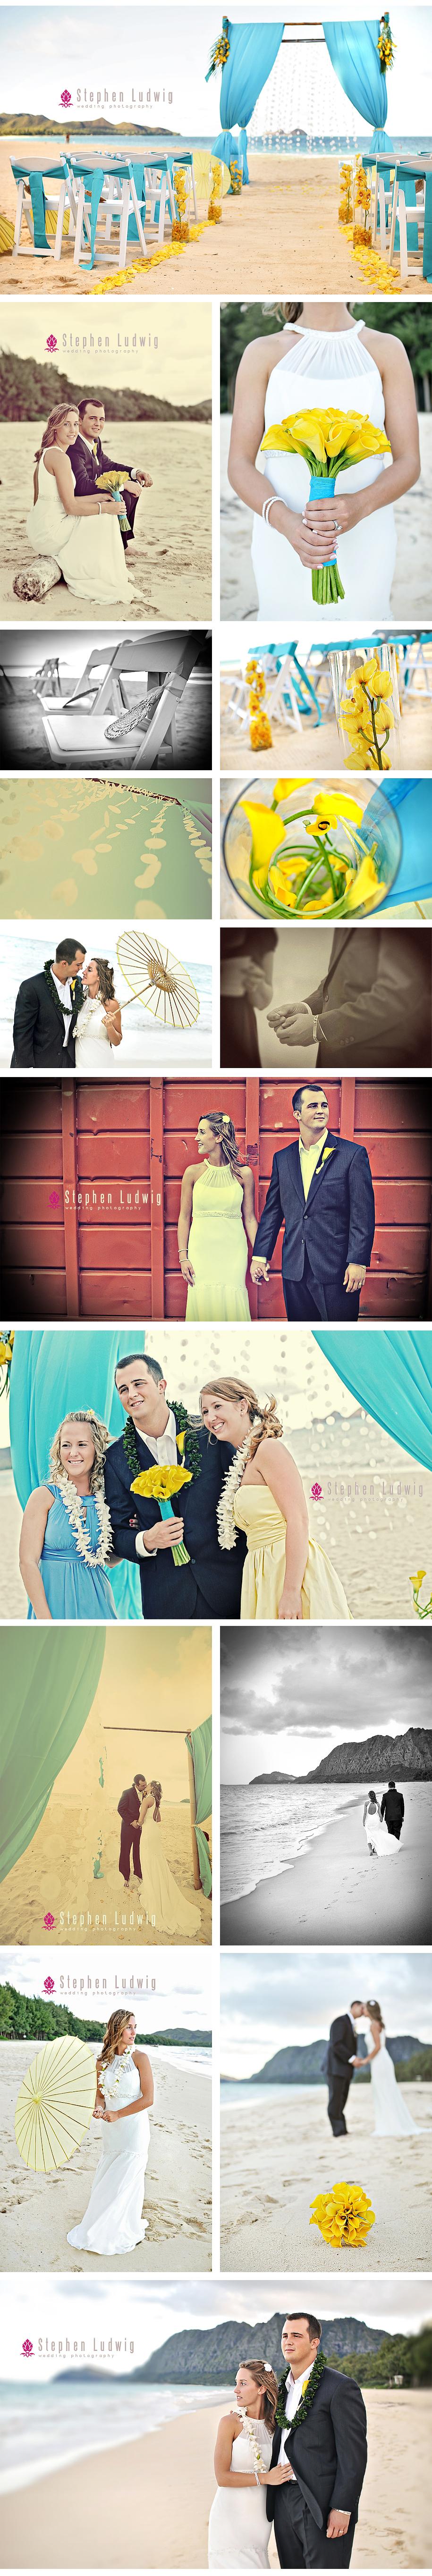 Stephen-Ludwig-Wedding-Photography--Scott-and-Chandra-3